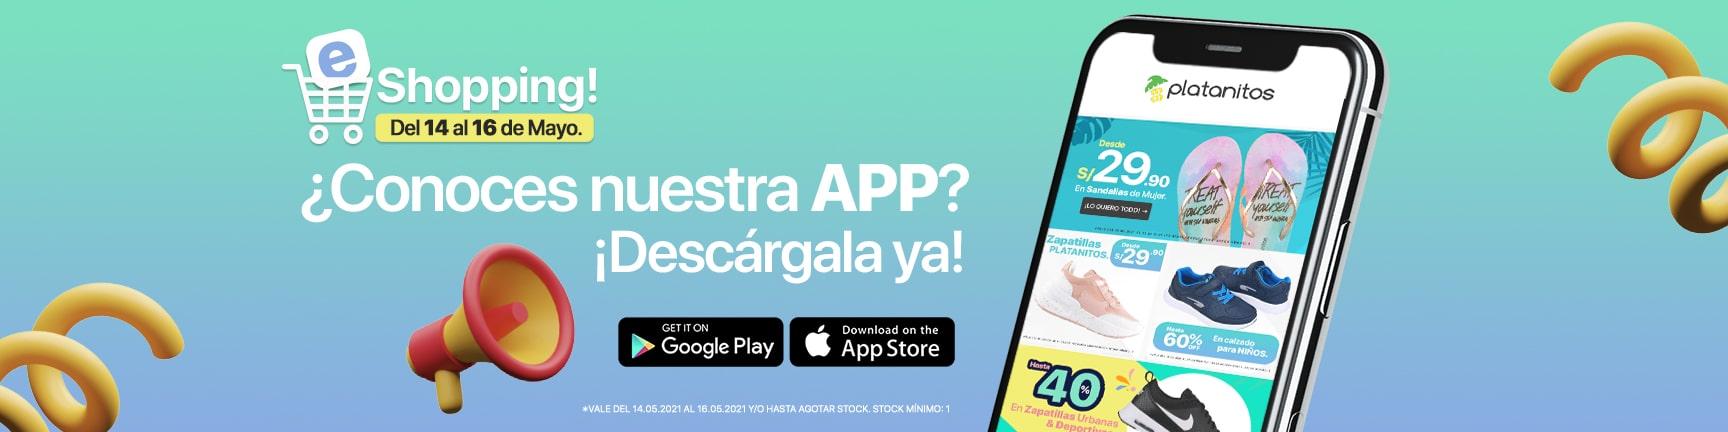 App platanitos